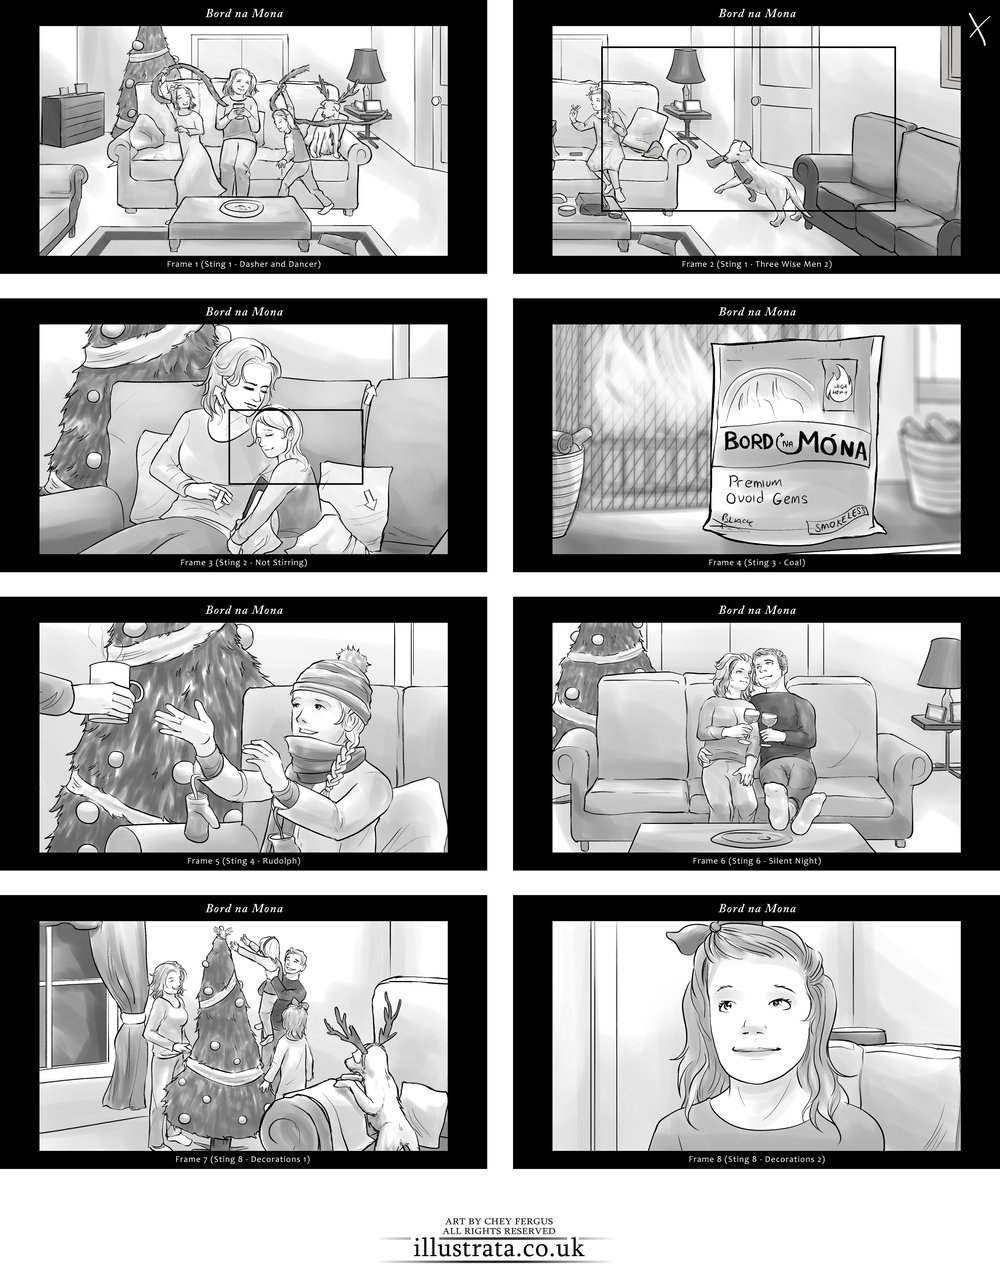 Storyboards BORD NA MONA.jpg